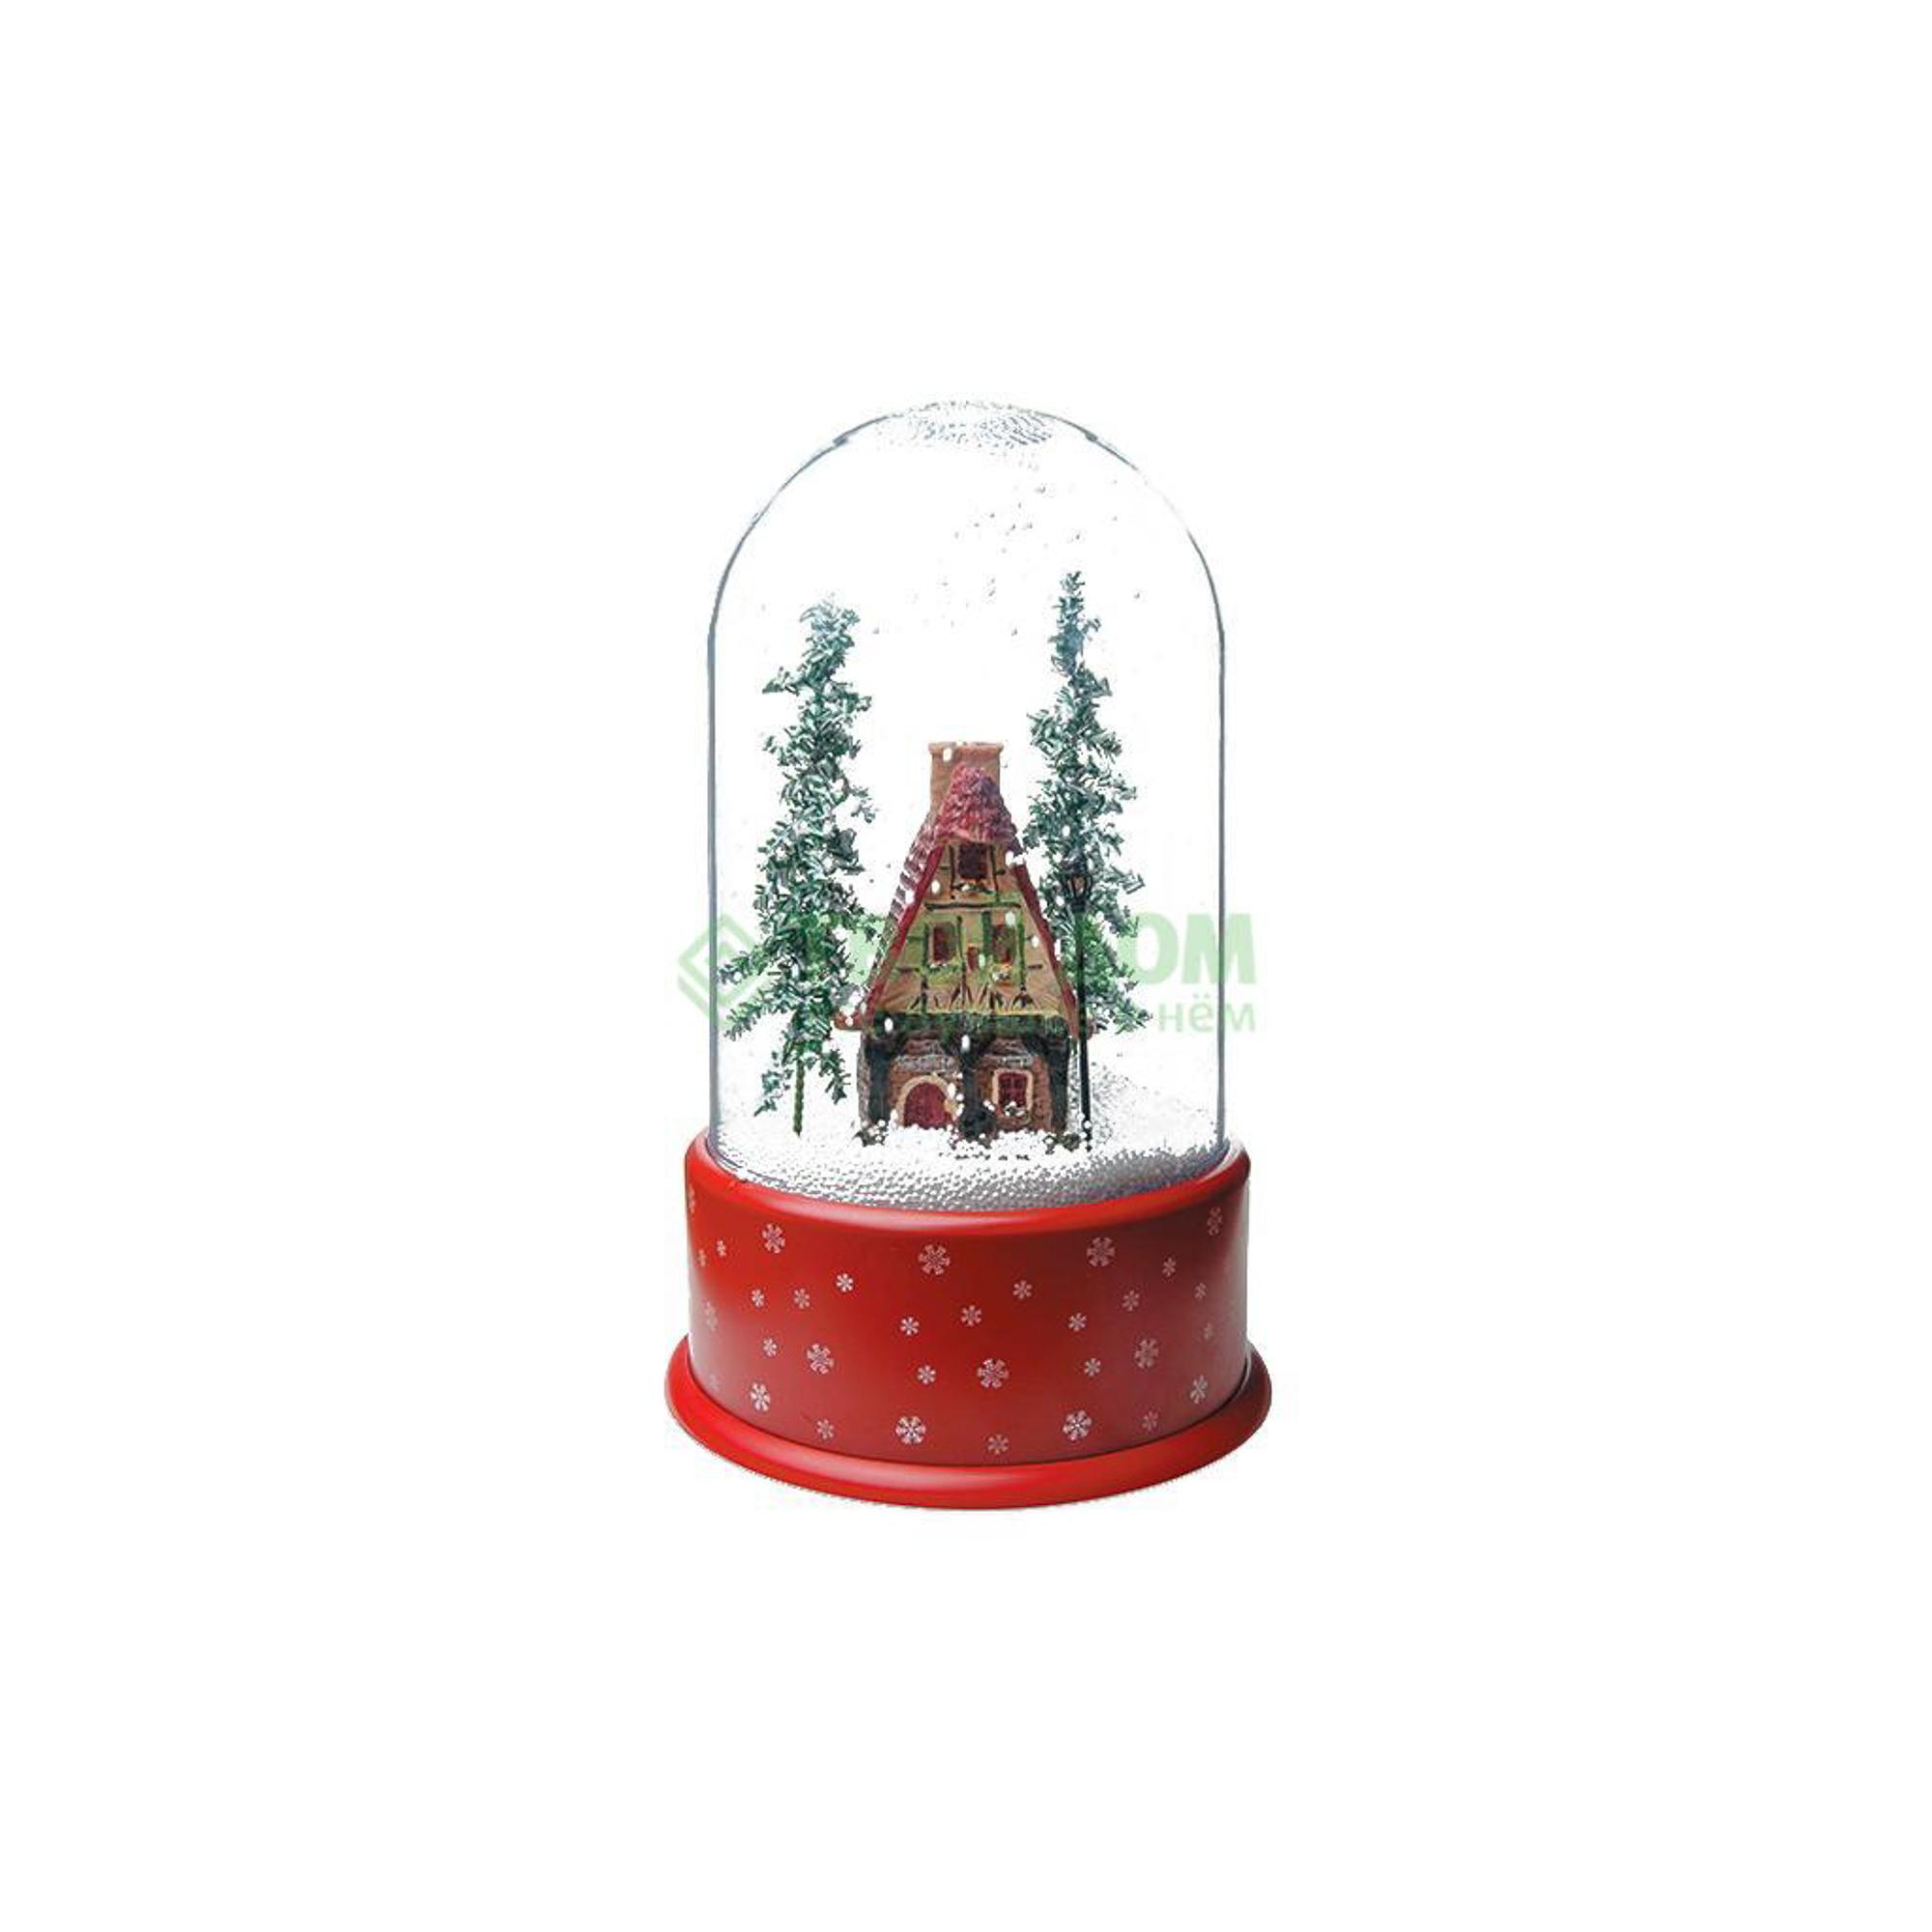 Сувенир новогодний домик